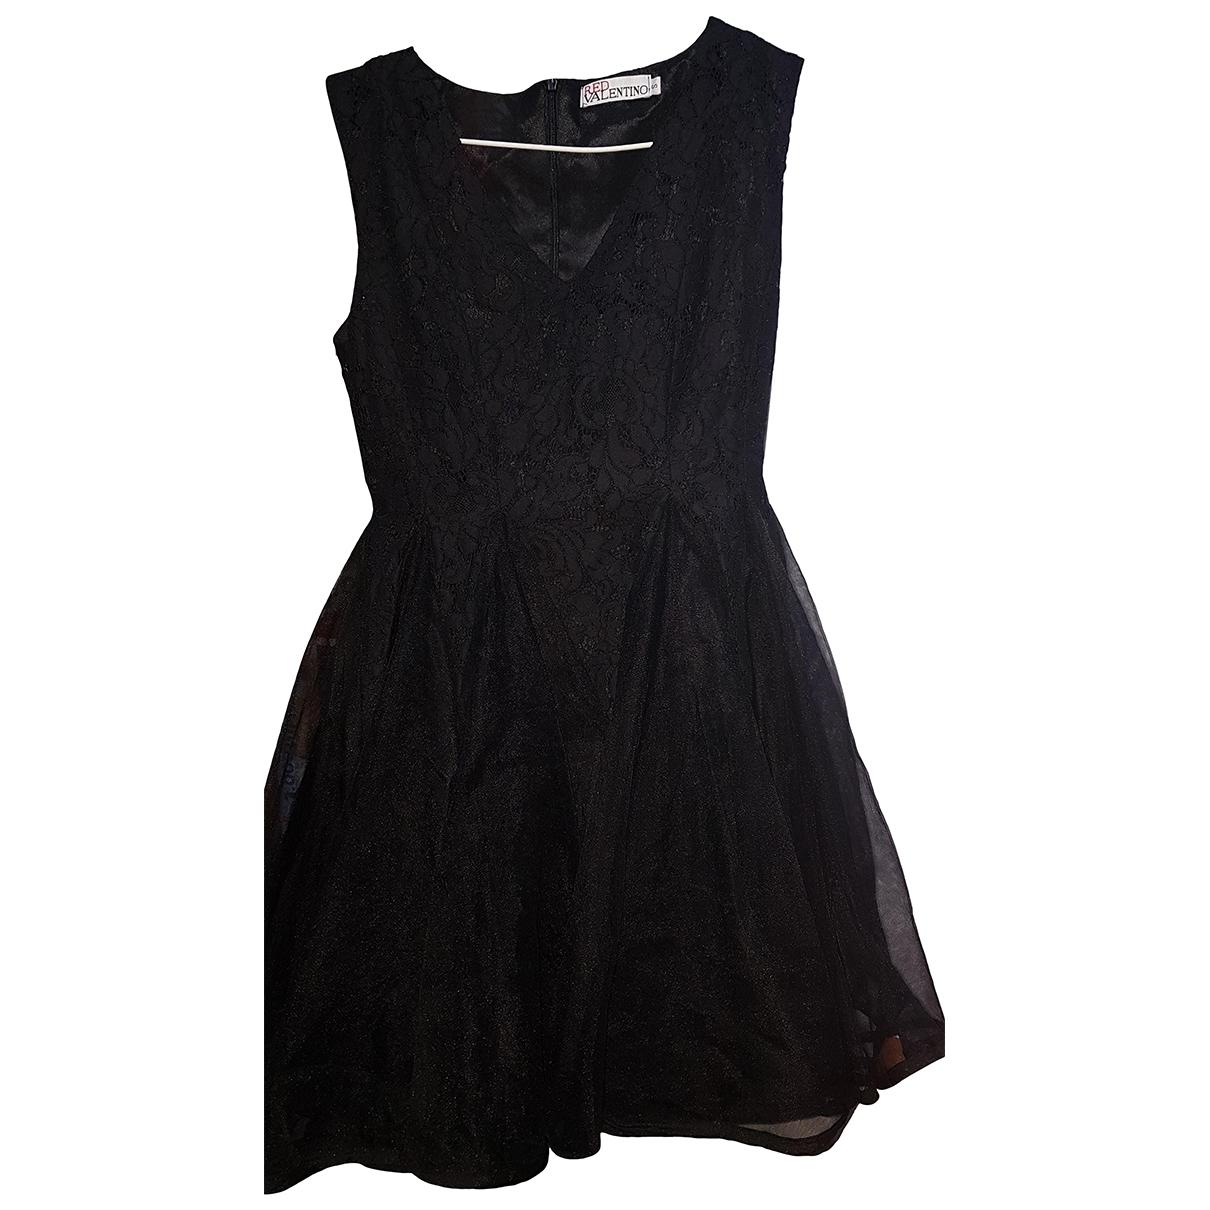 Red Valentino Garavani \N Black Lace dress for Women S International